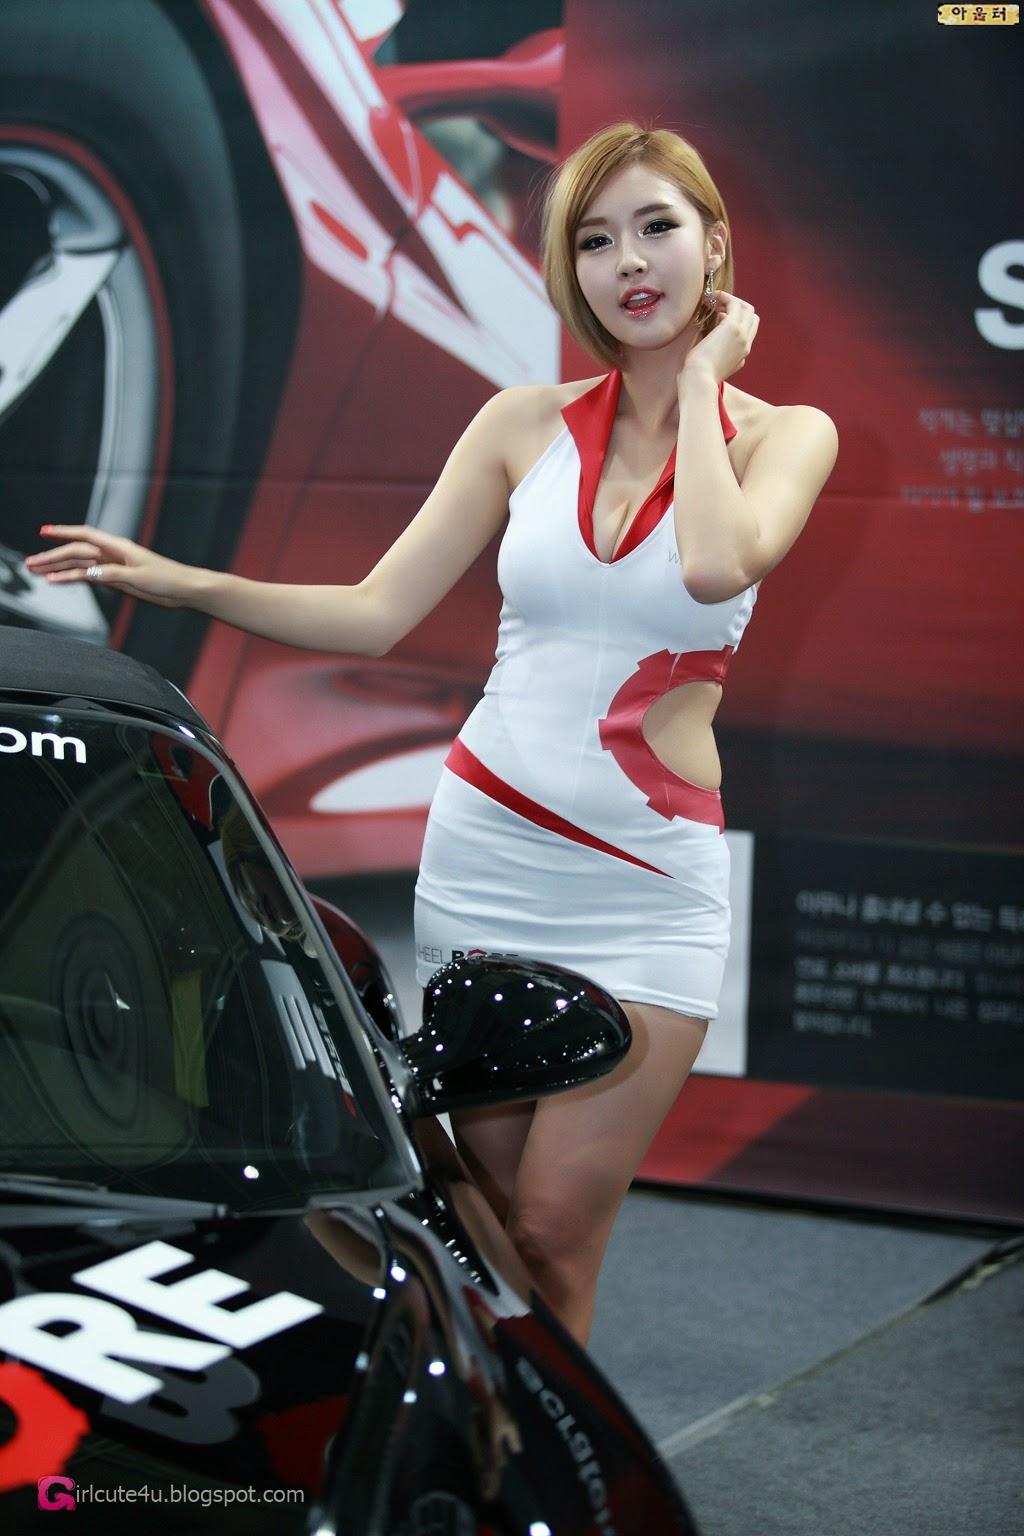 2 Choi Byeol Ha - Seoul Auto Salon 2014 - very cute asian girl-girlcute4u.blogspot.com